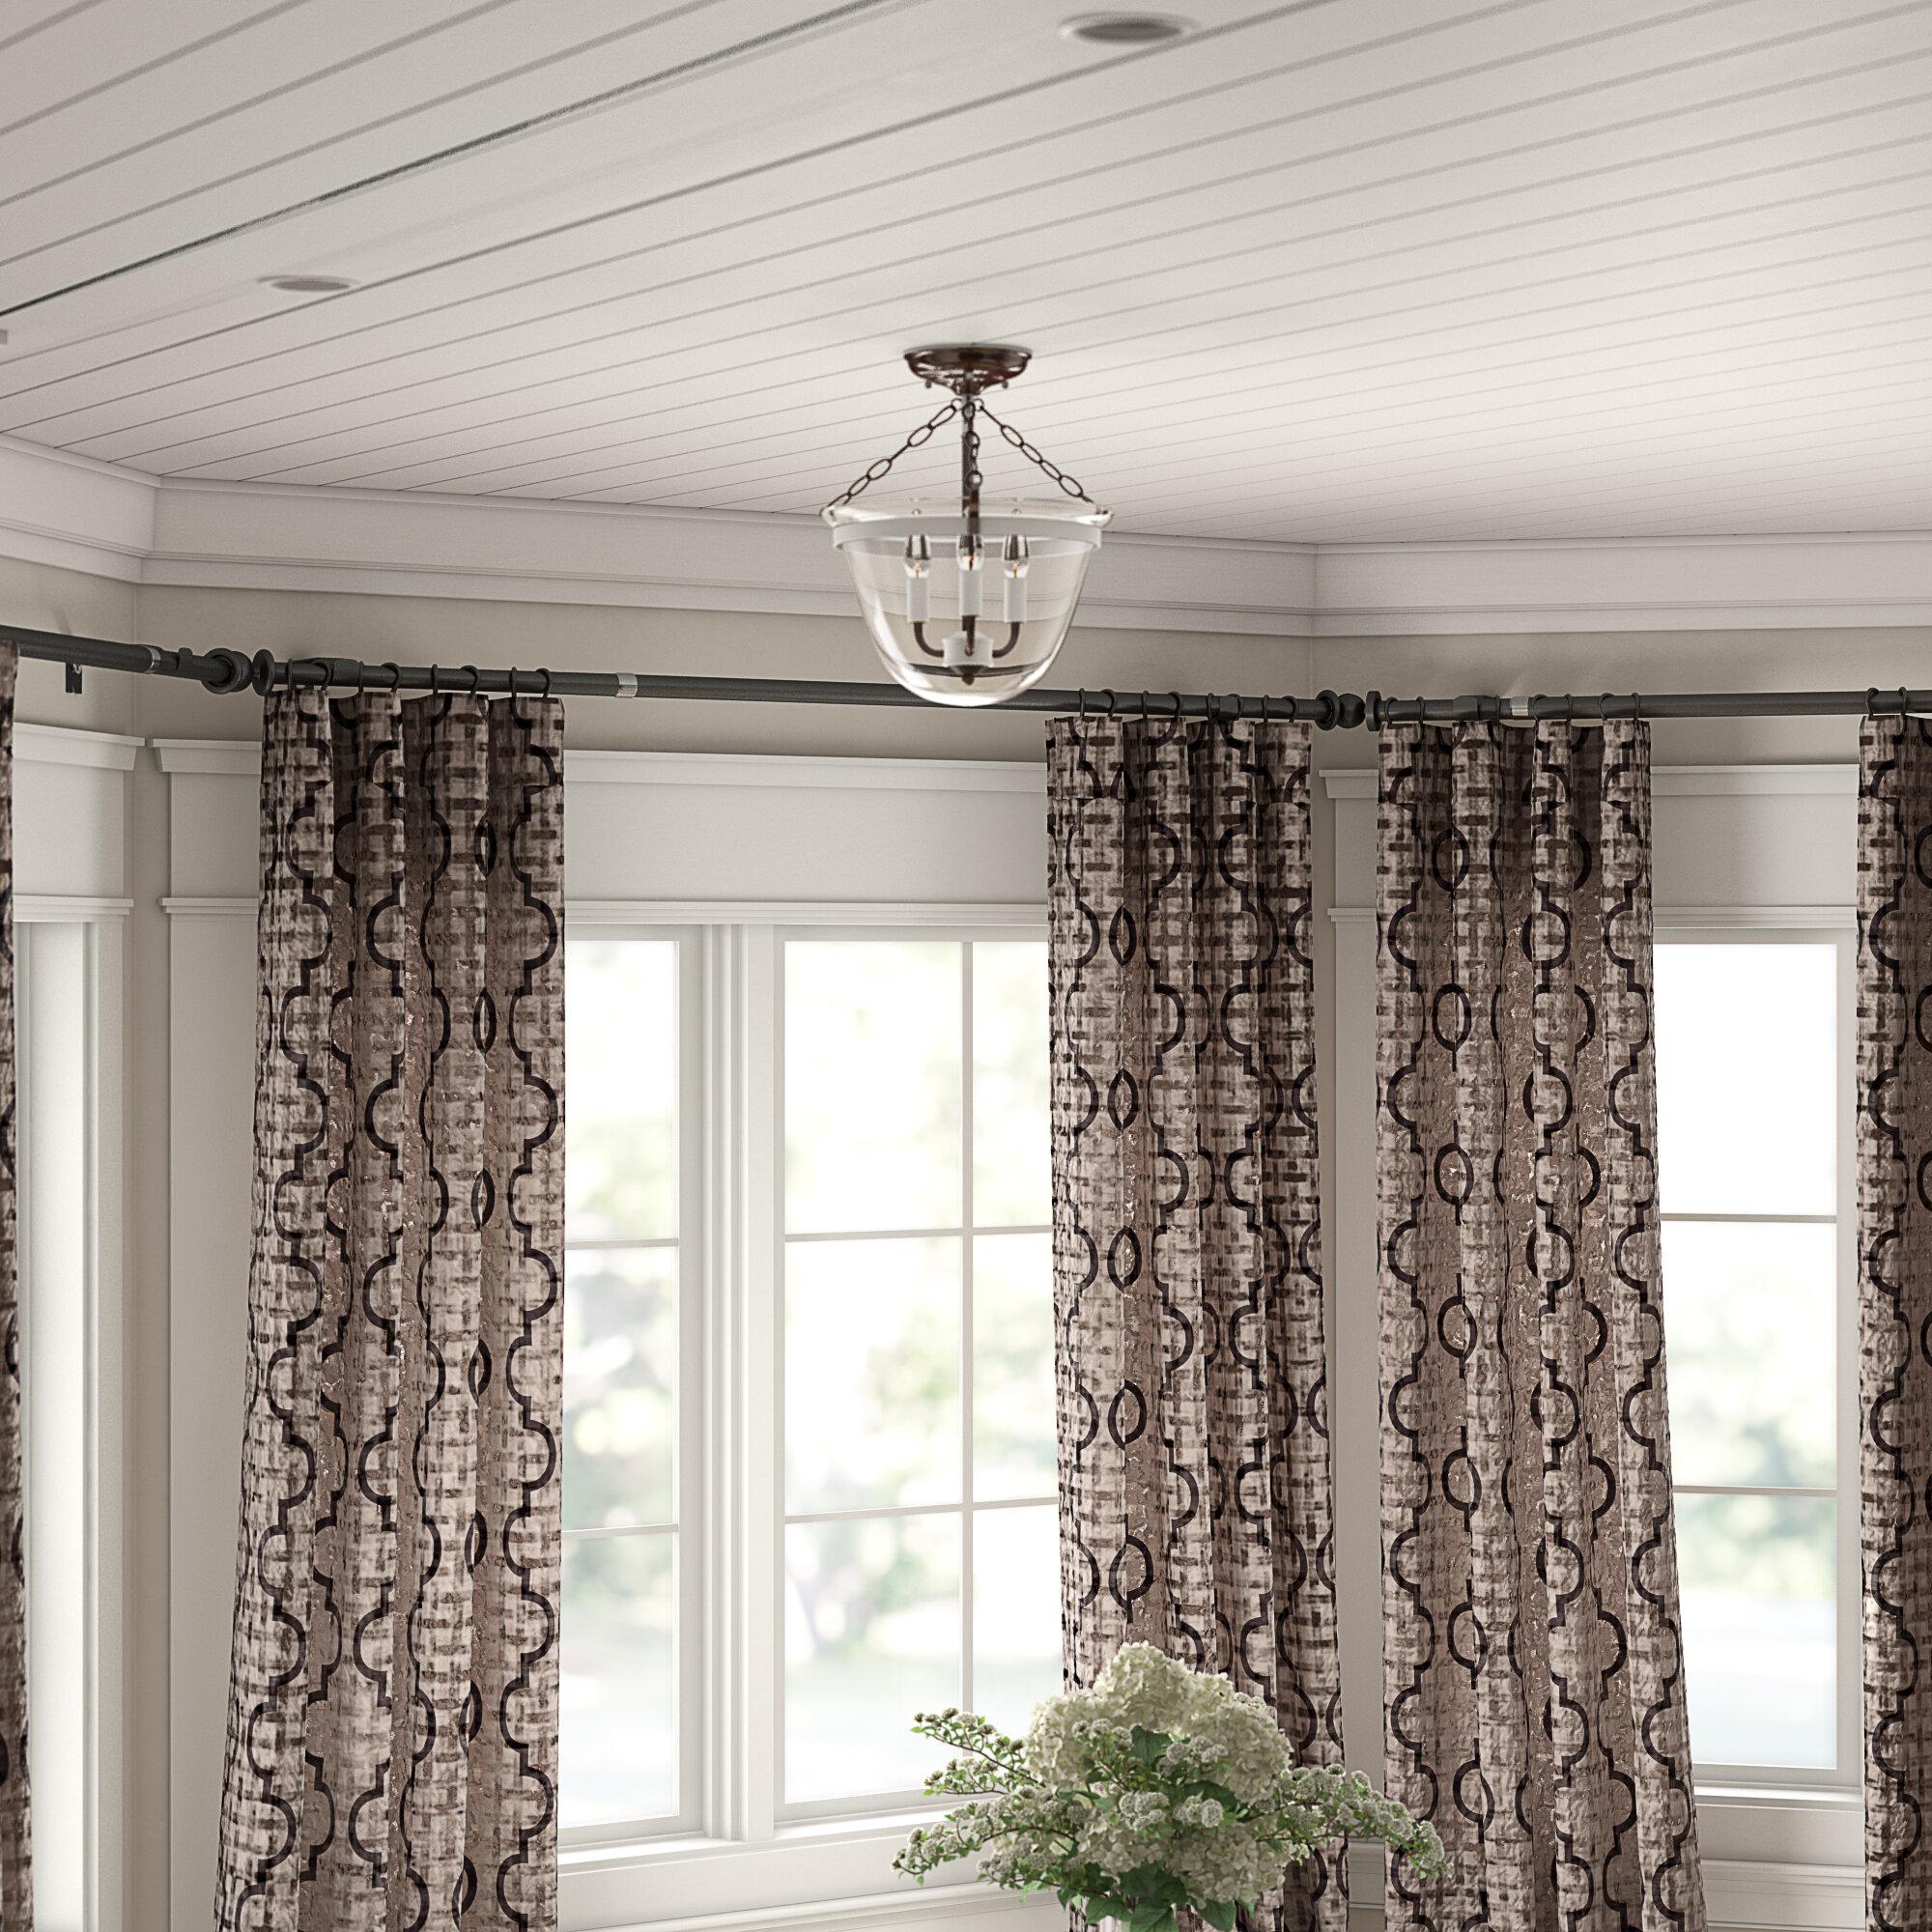 Leavy Bay Window Single Curtain Rod Hardware Set Reviews